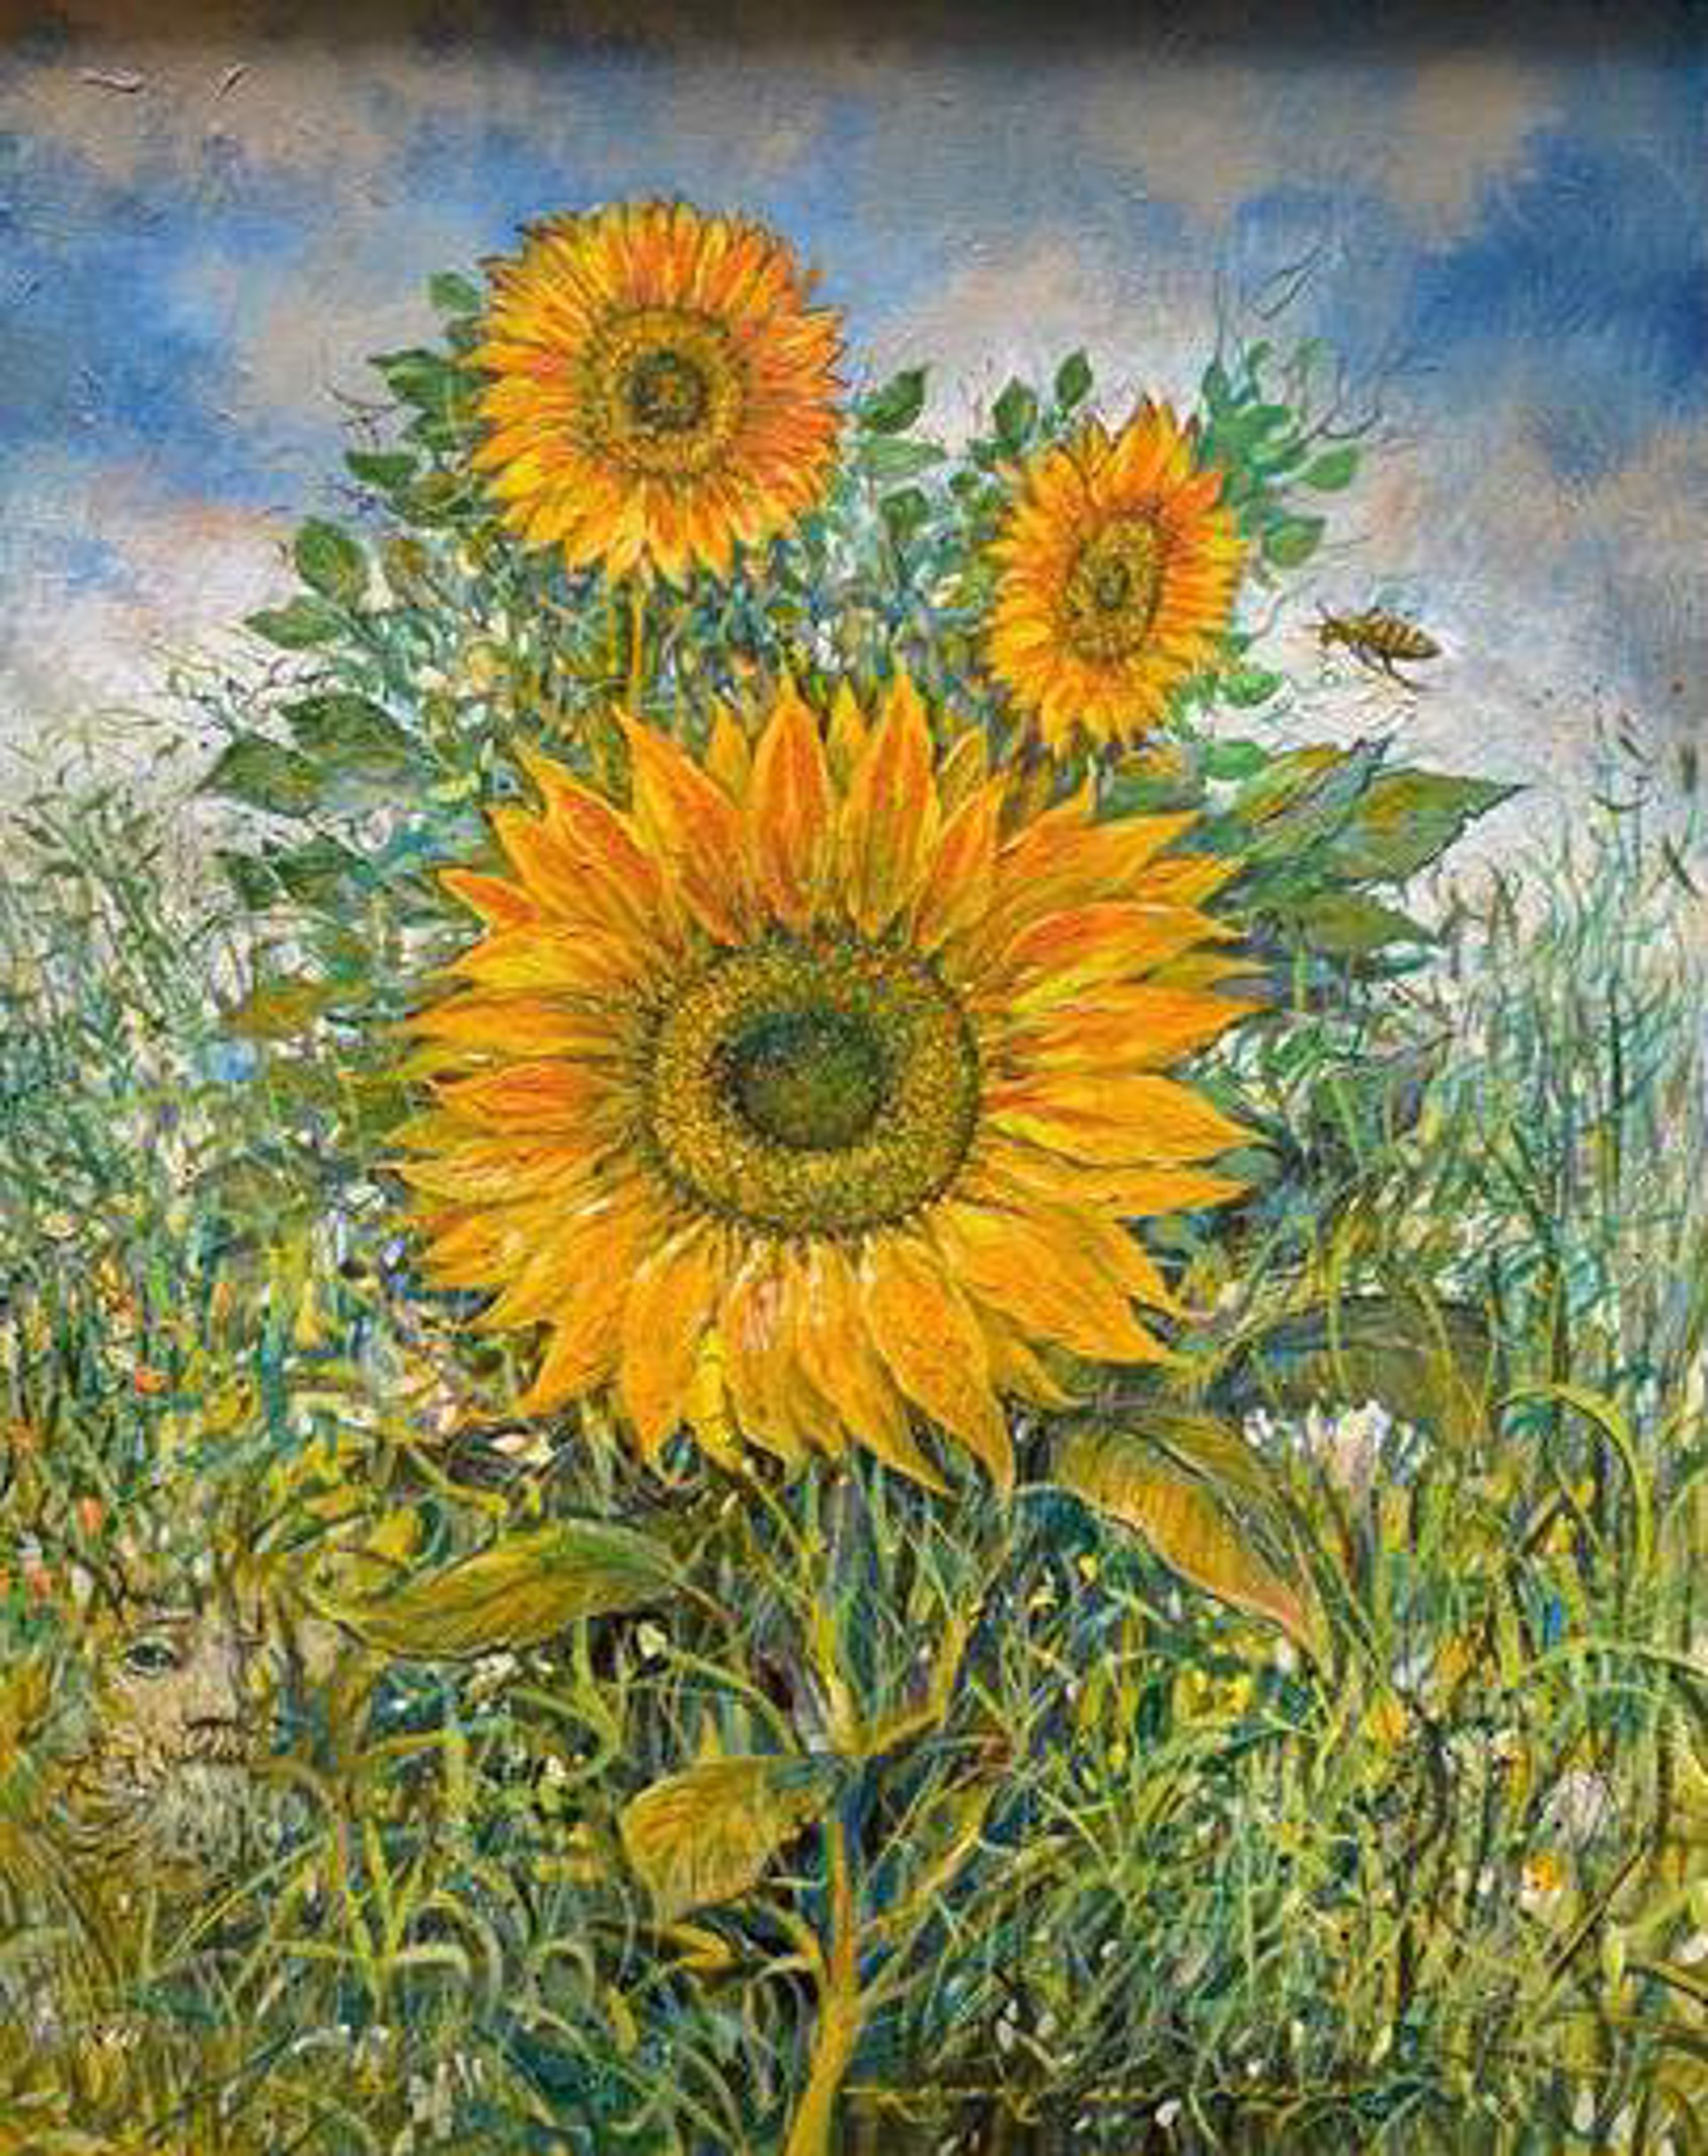 September Wind by Robert Lyn Nelson